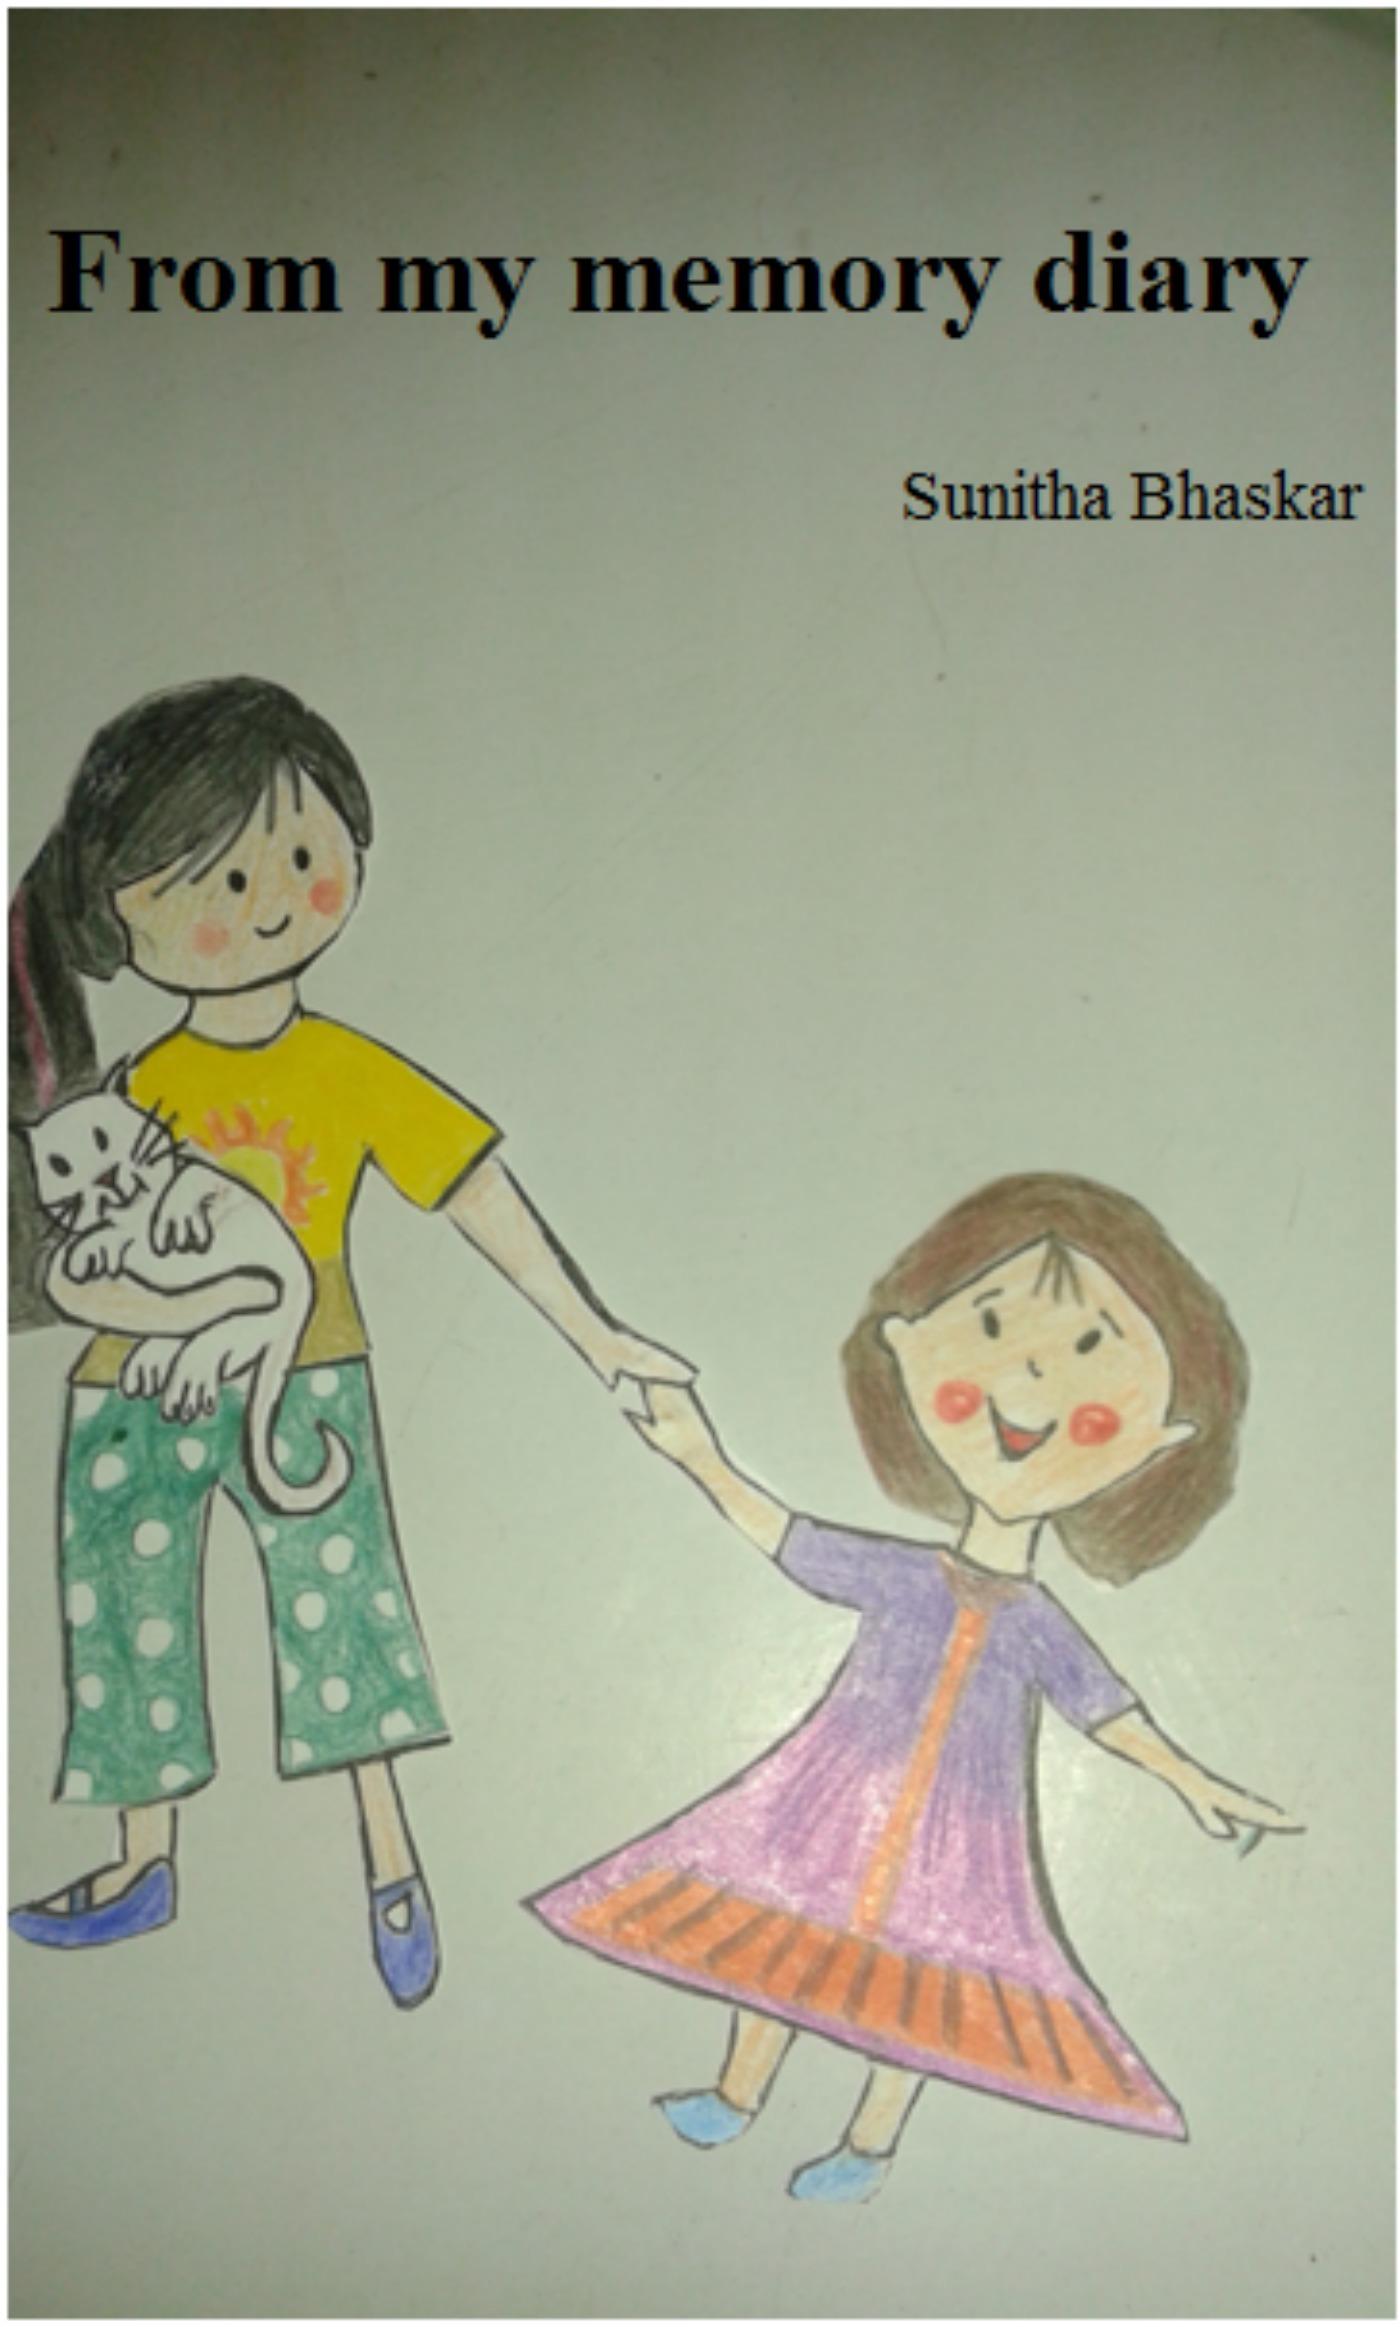 From My Memory Diary Sunitha Bhaskar